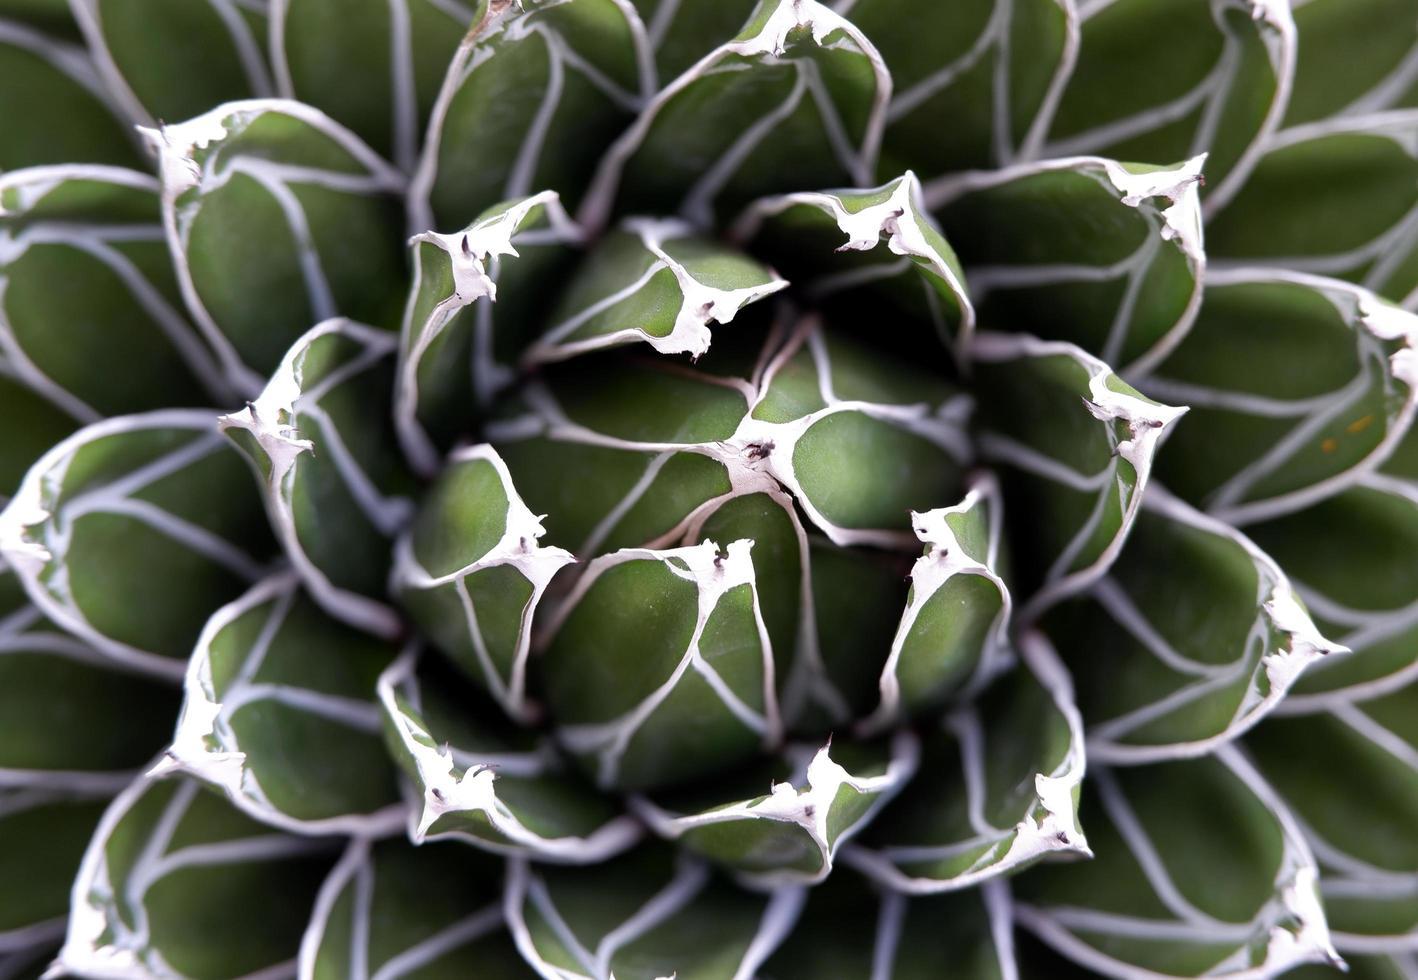 Close-up of succulent plant photo